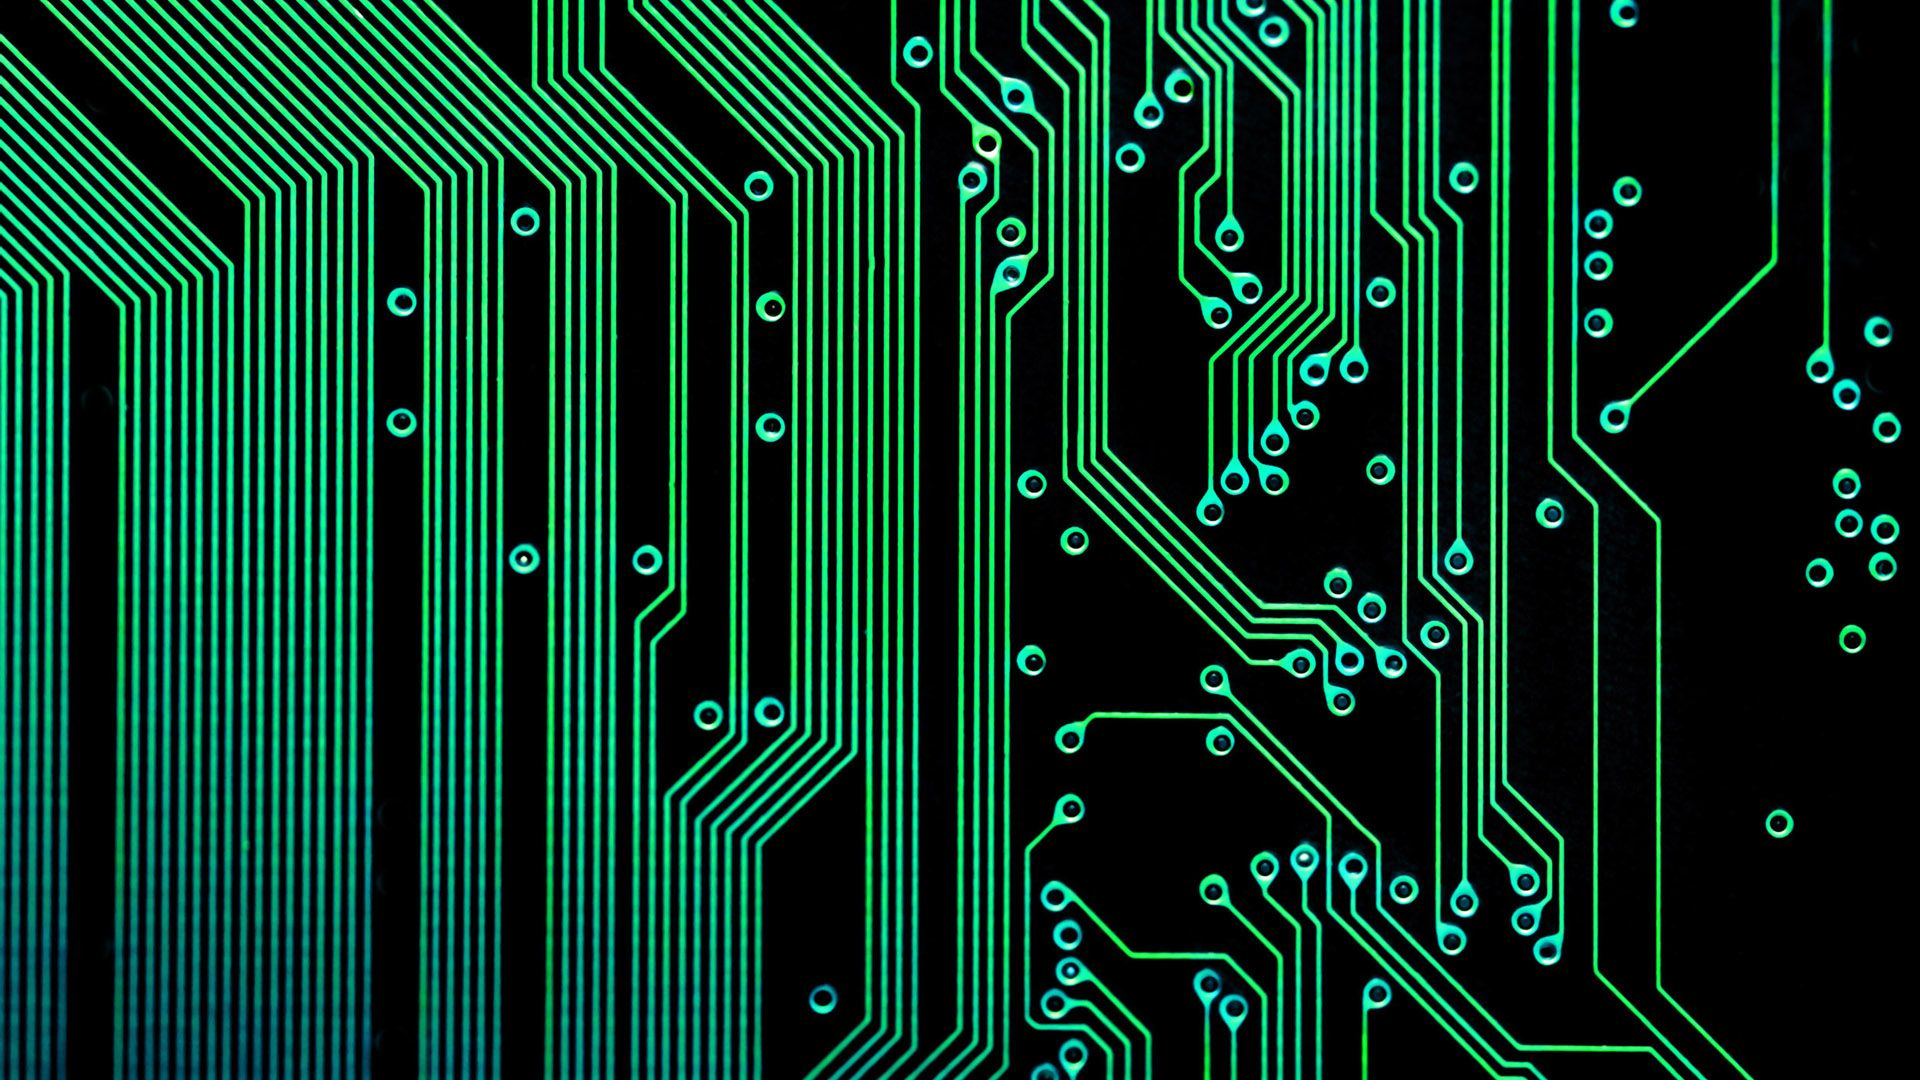 circuit board wallpaper Google Search